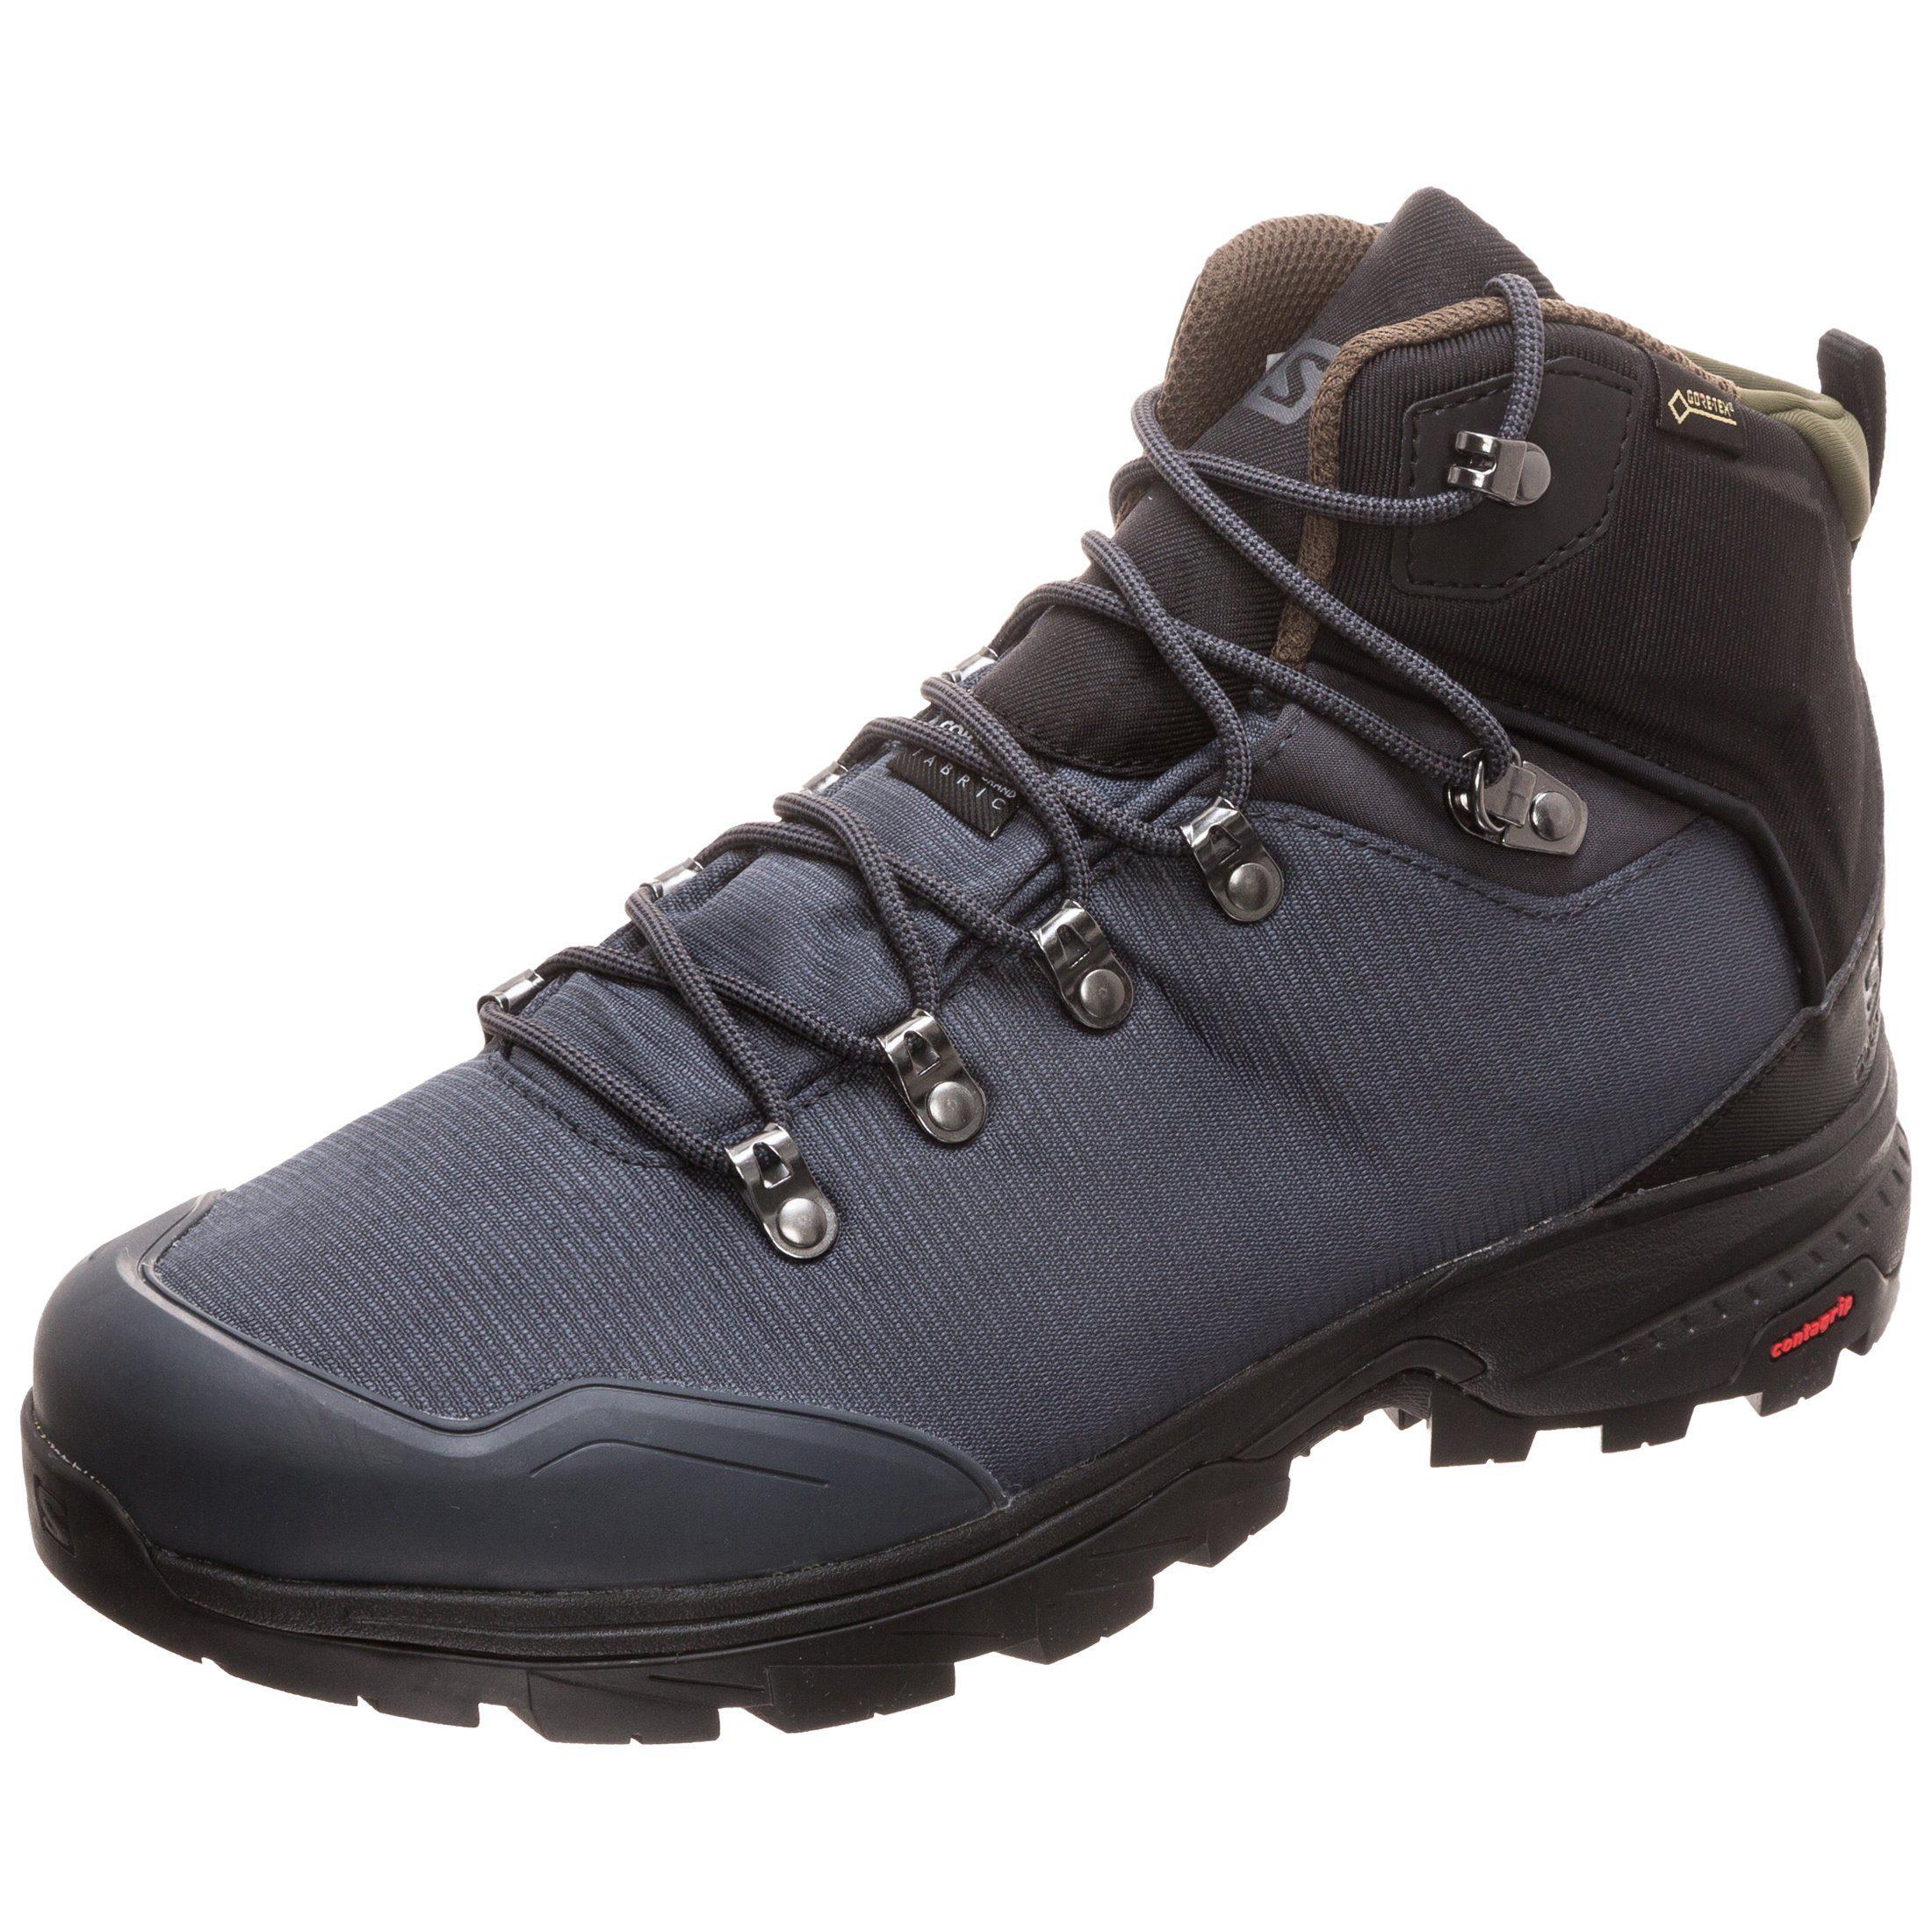 Salomon Laufschuh Outback 500 Gtx | Schuhe > Sportschuhe > Laufschuhe | Grau | Salomon